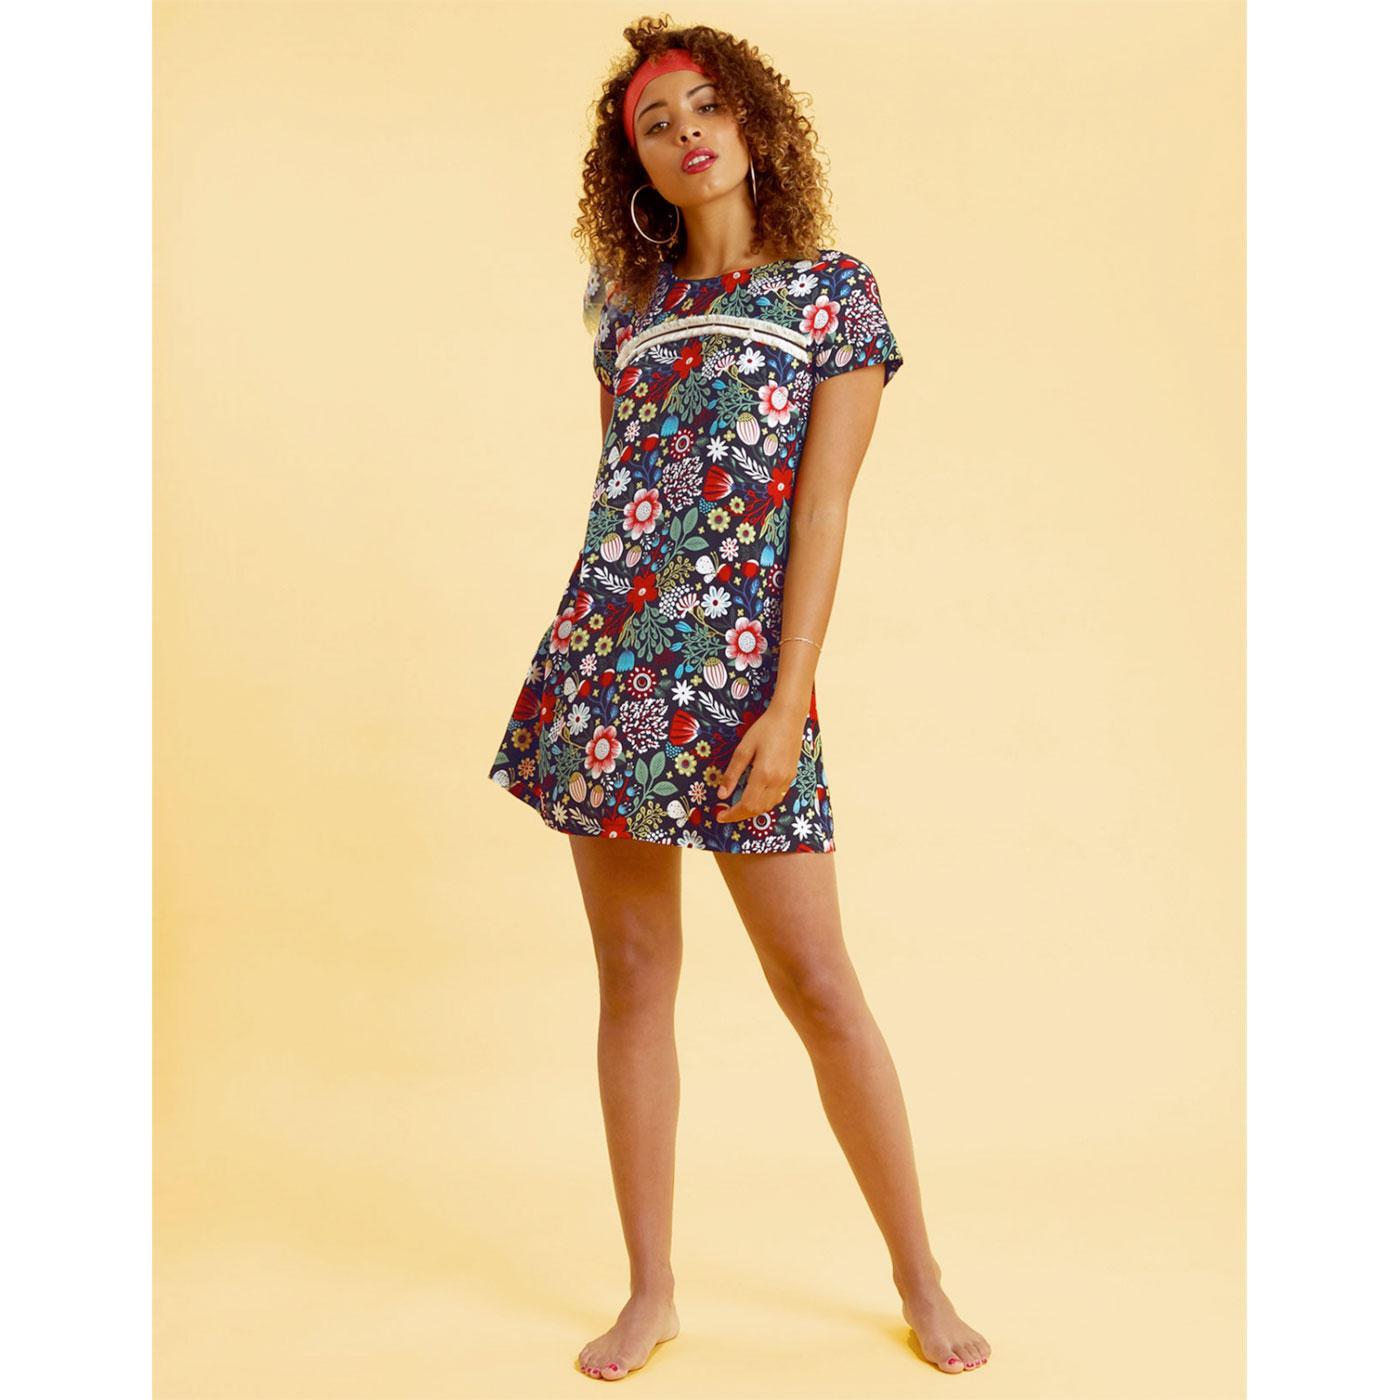 Maude's Meadow TRAFFIC PEOPLE Retro 60s Mod Dress